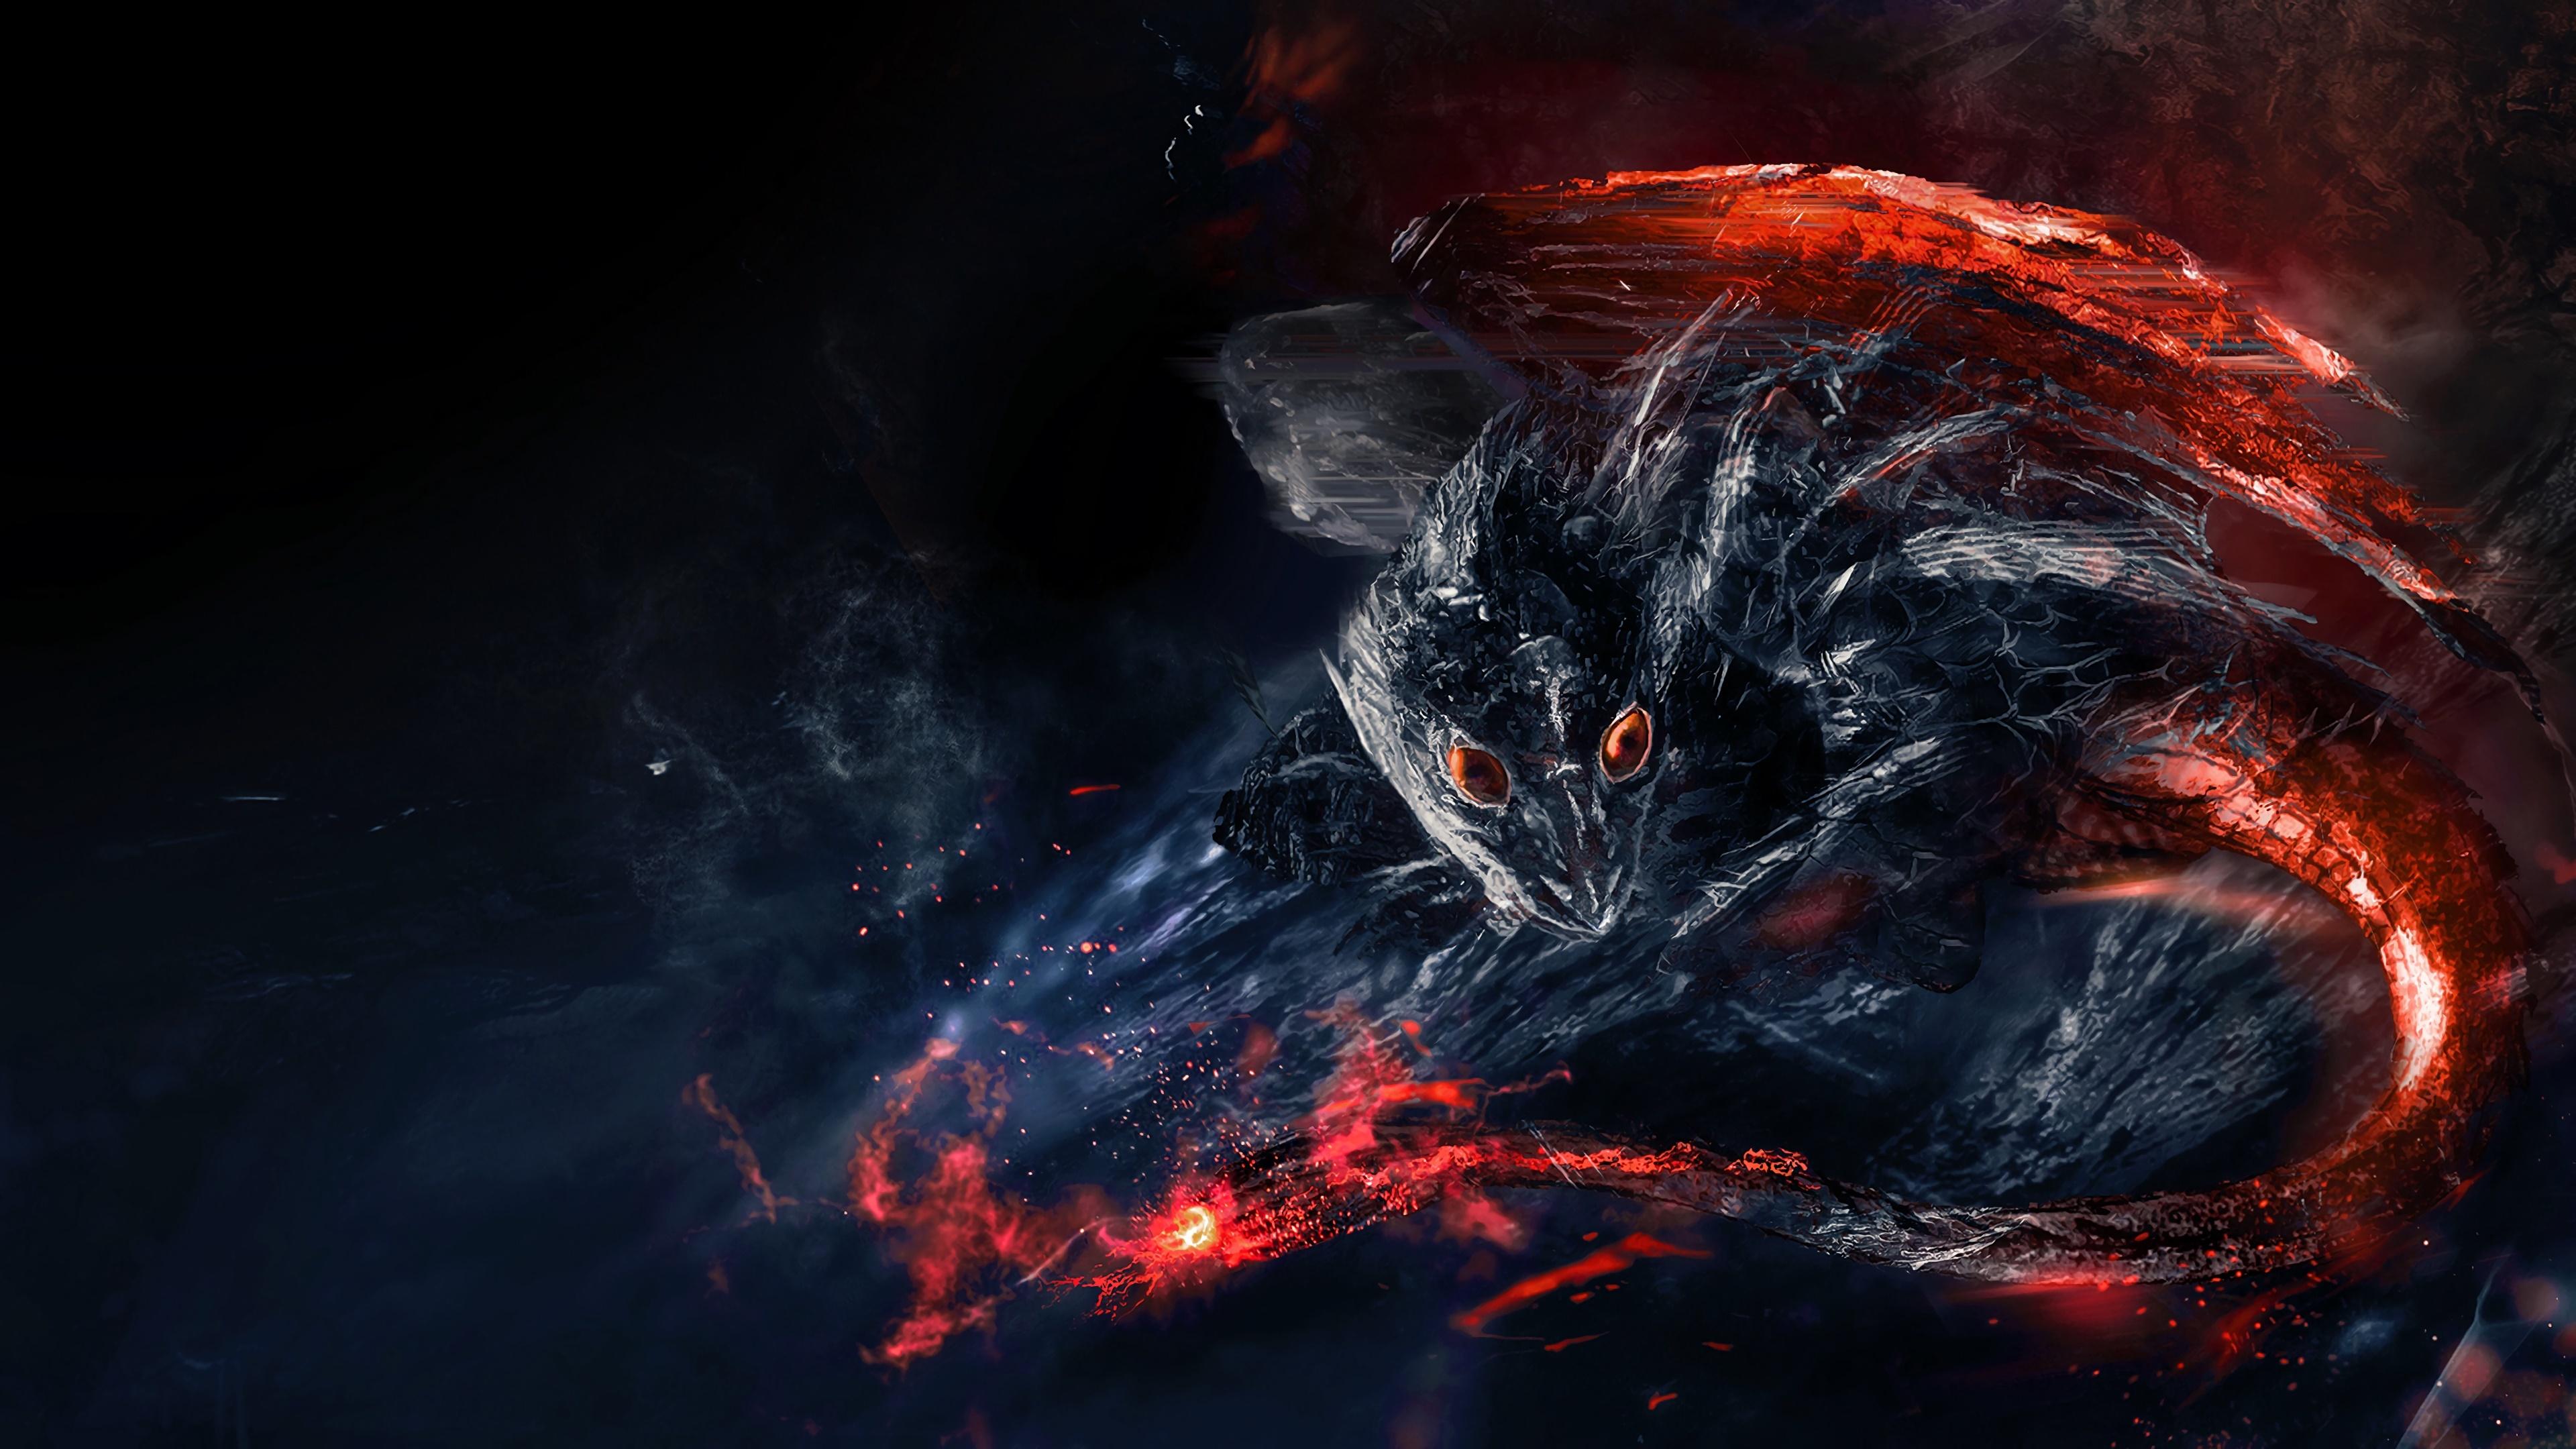 Red-eyed Dragon 4K UltraHD Wallpaper - backiee